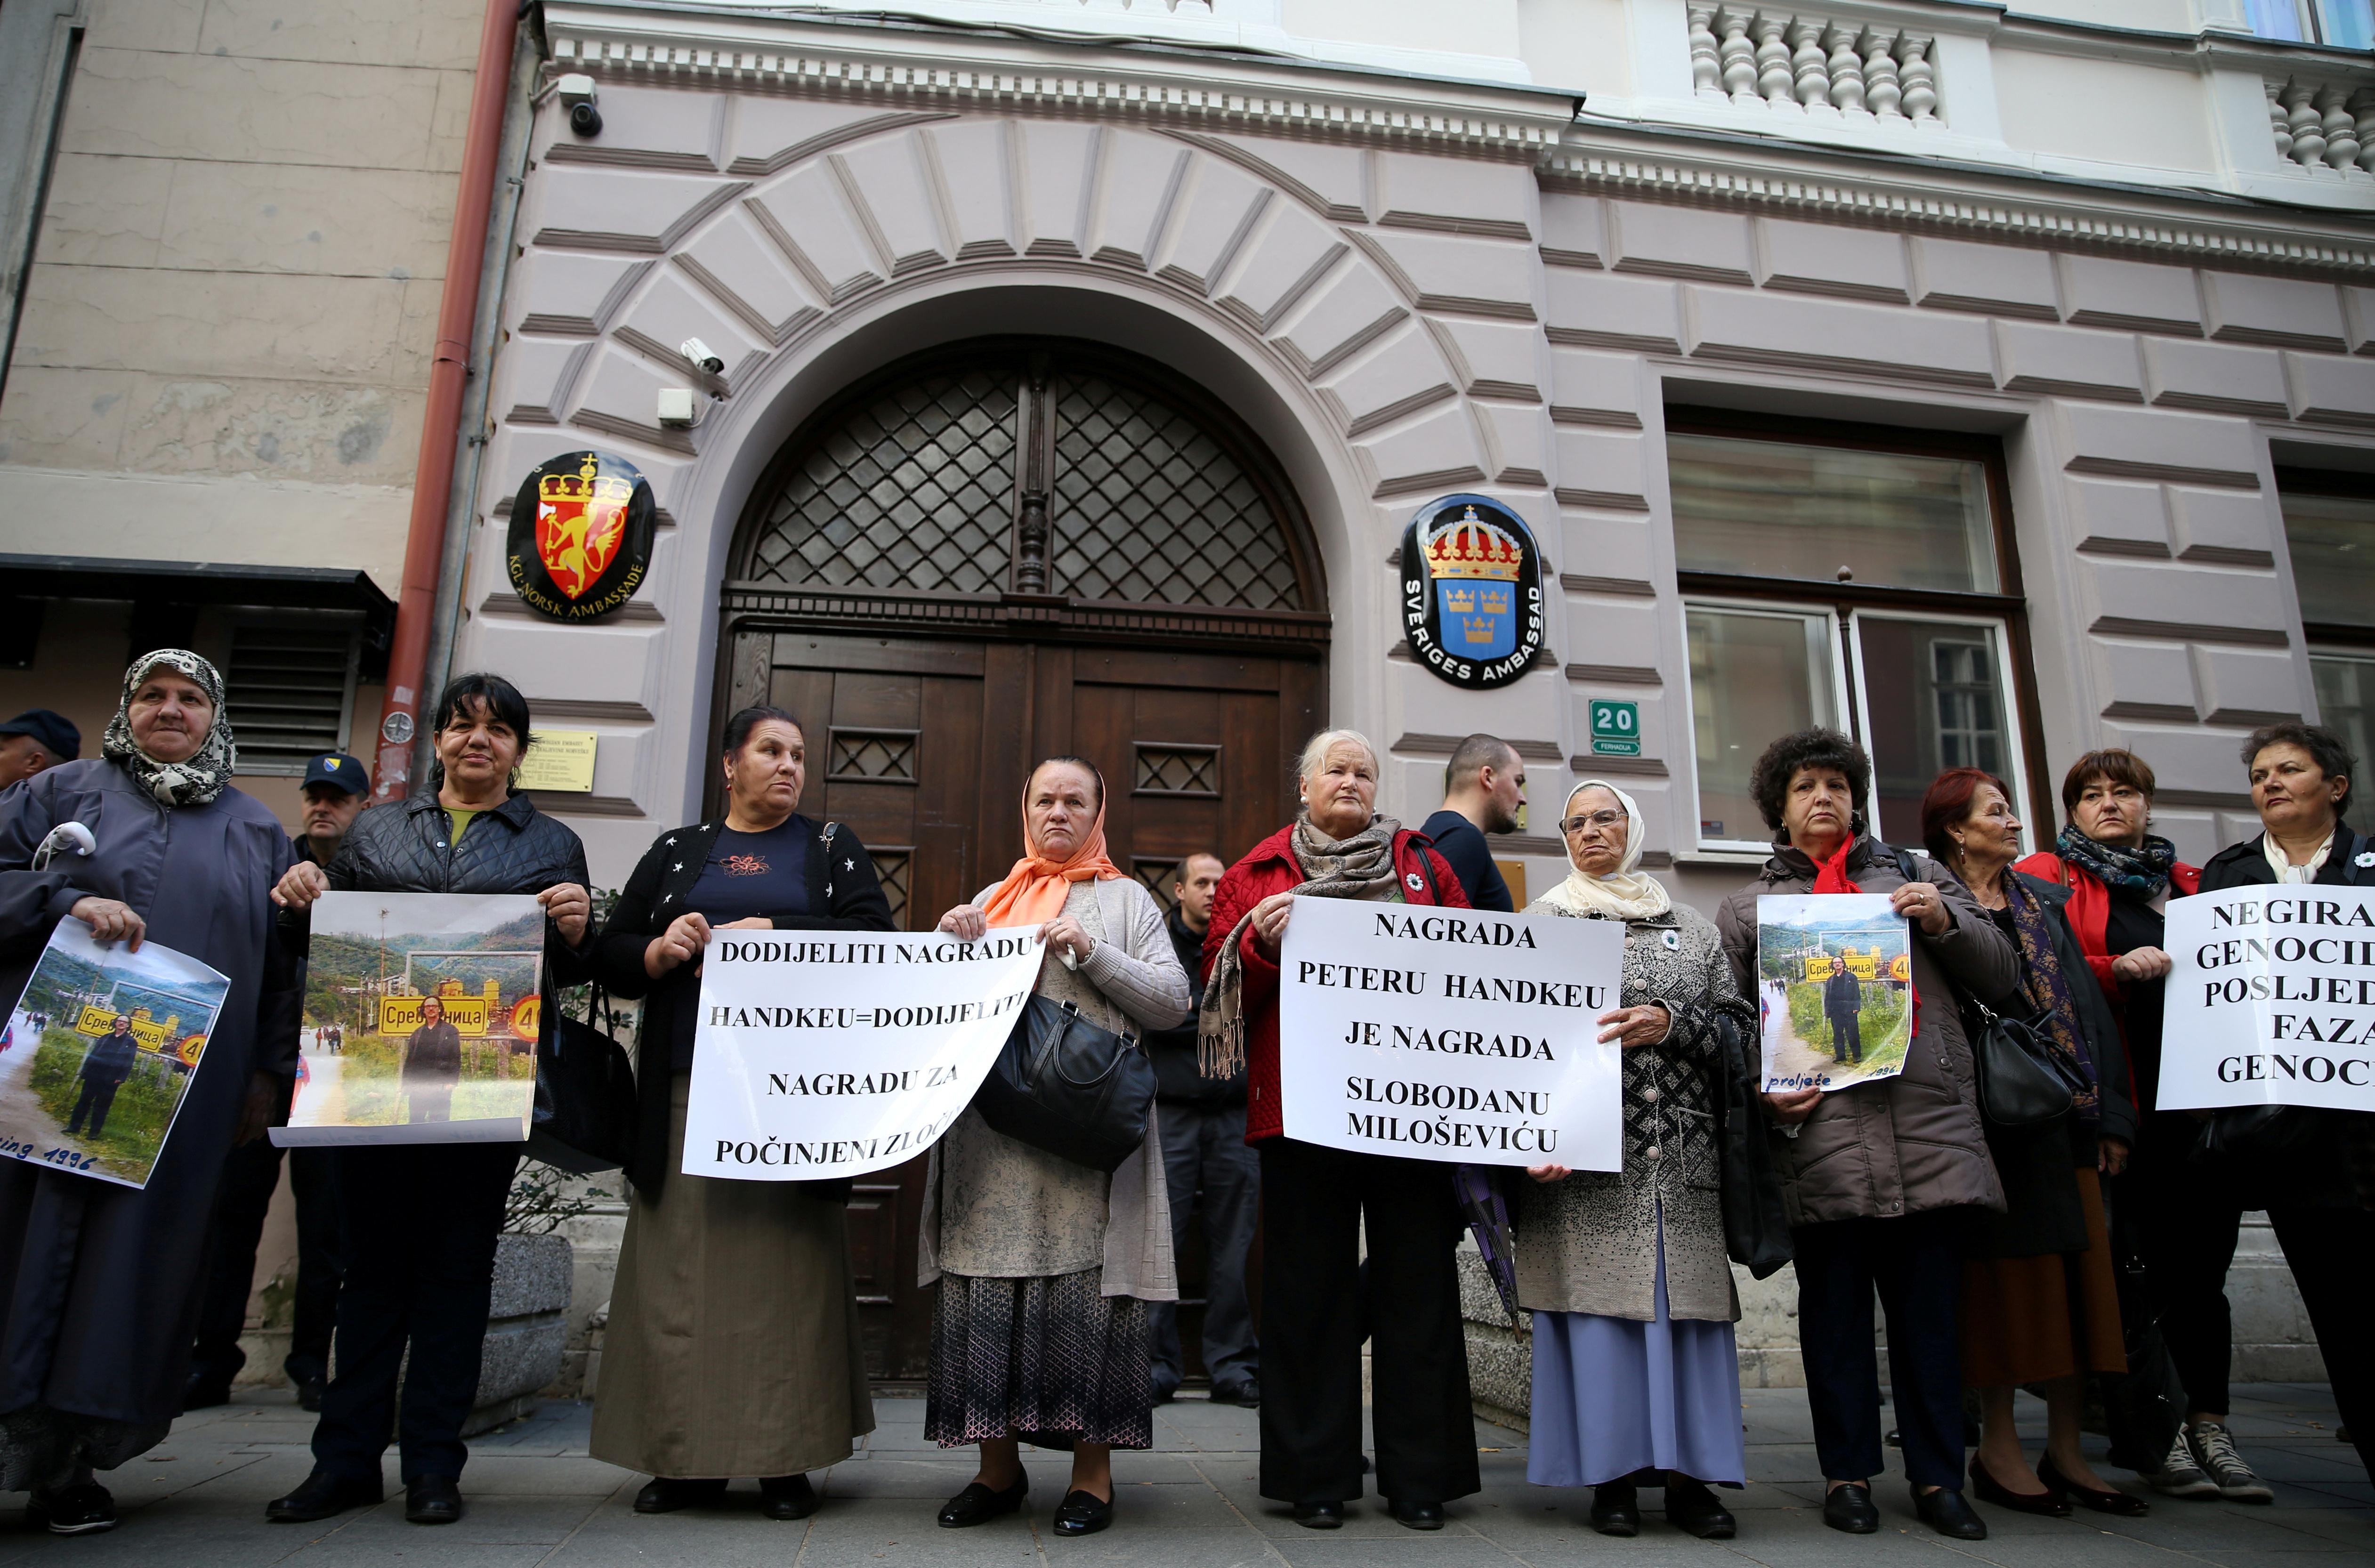 Turkey joins Nobel ceremony boycott in protest against Handke